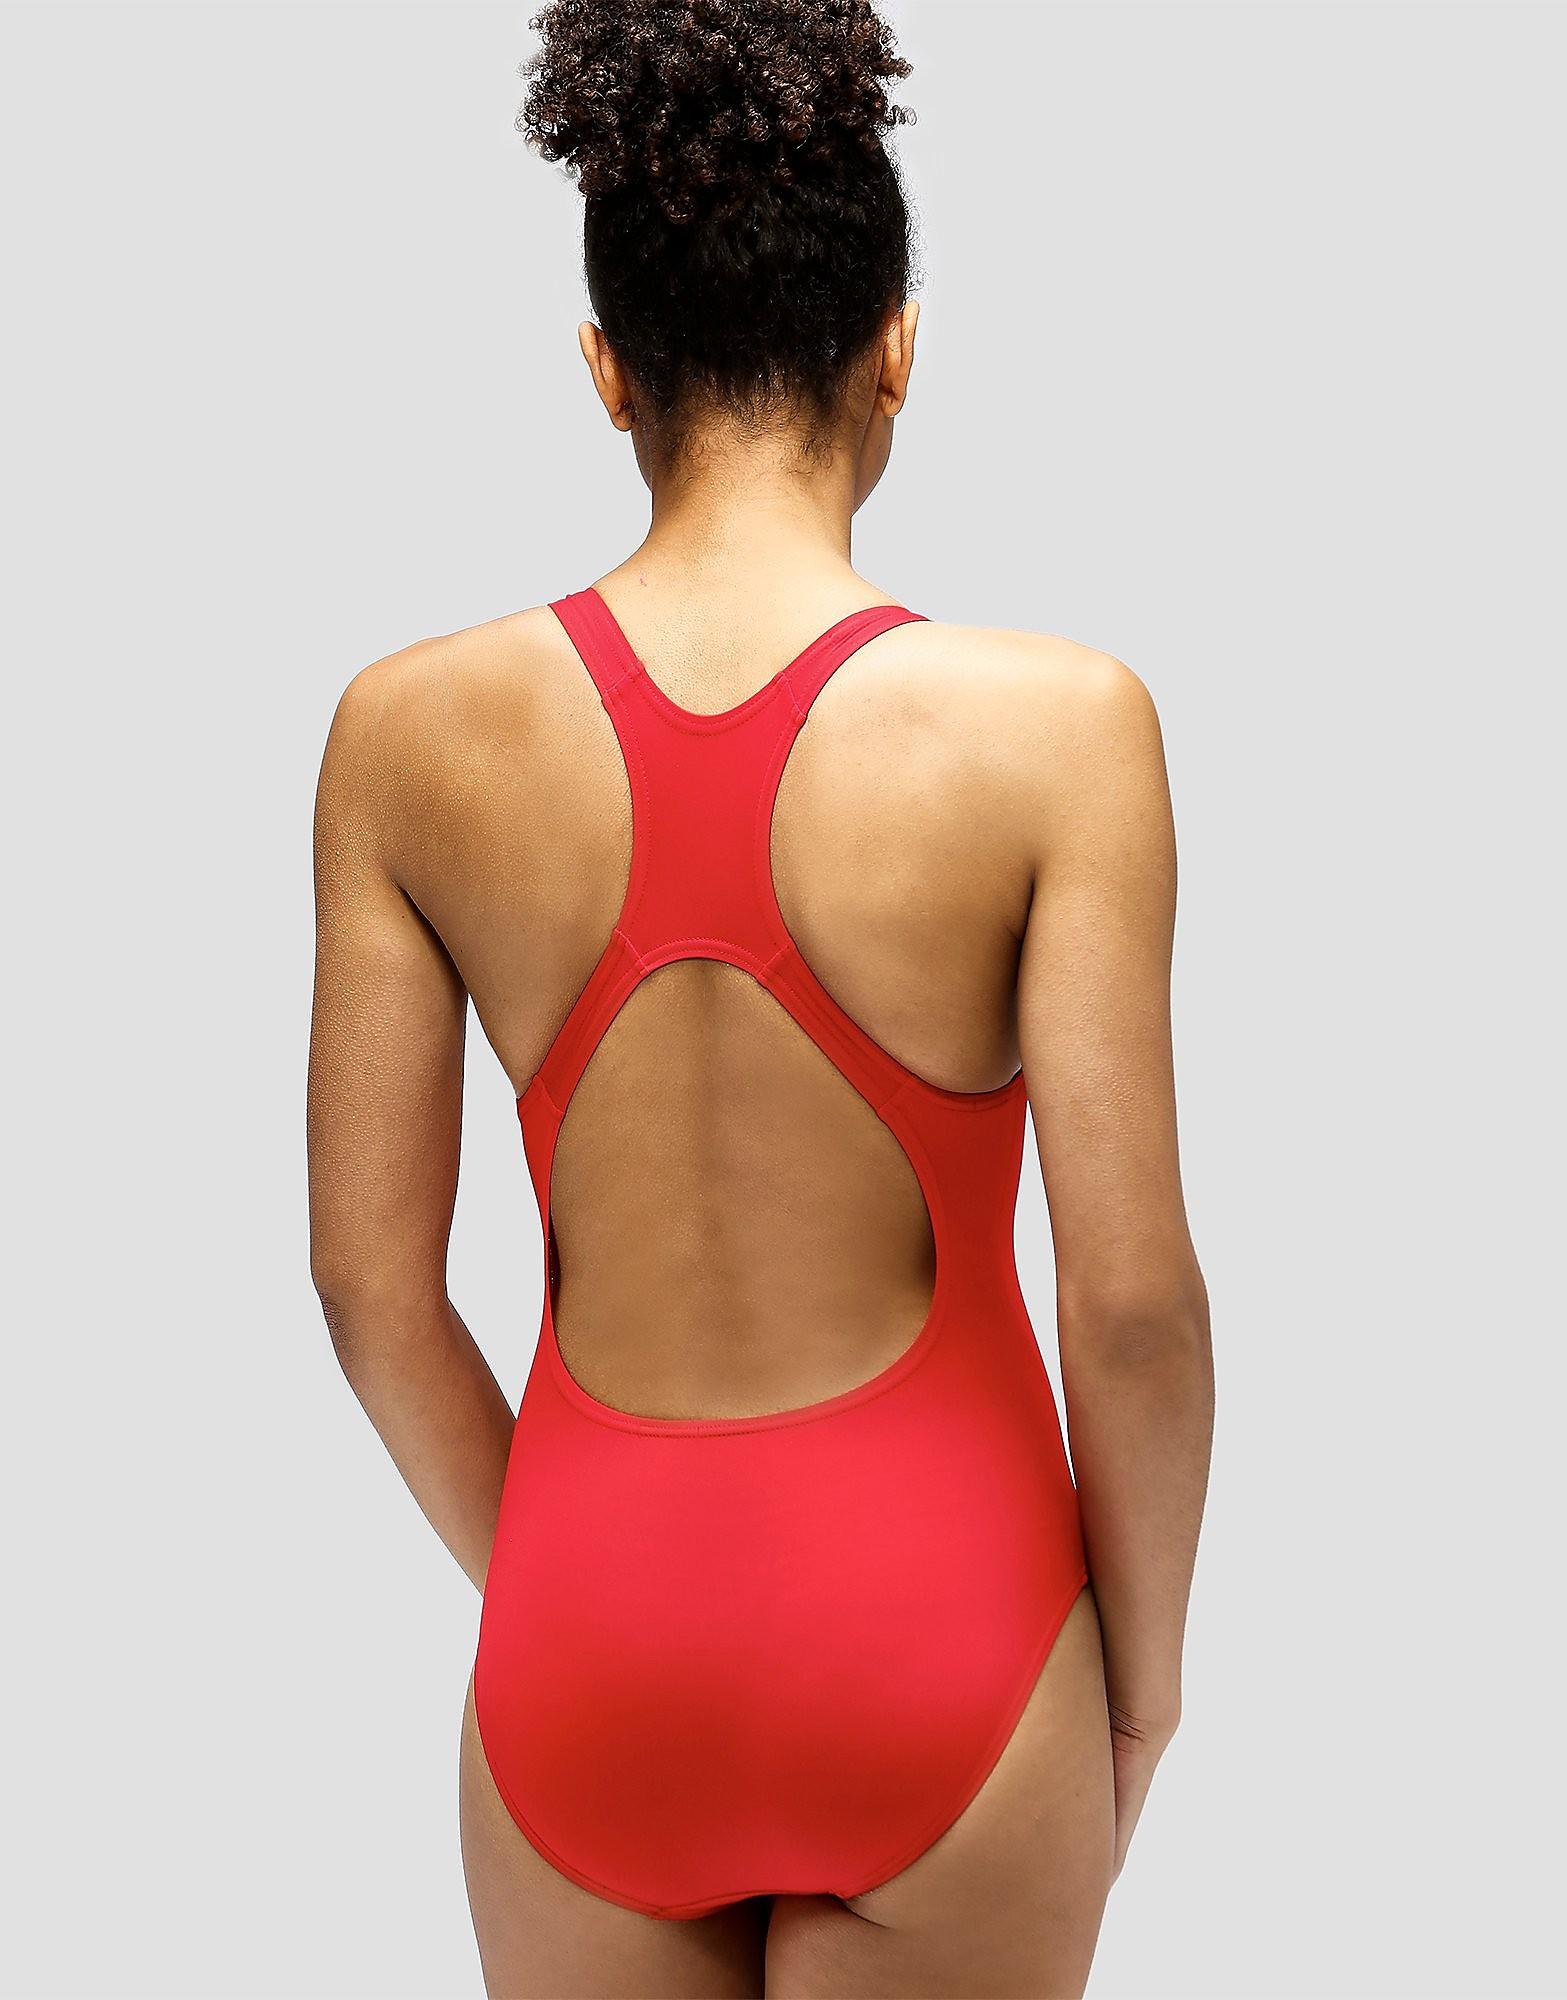 Speedo Women's Endurance+ Medalist Swimsuit